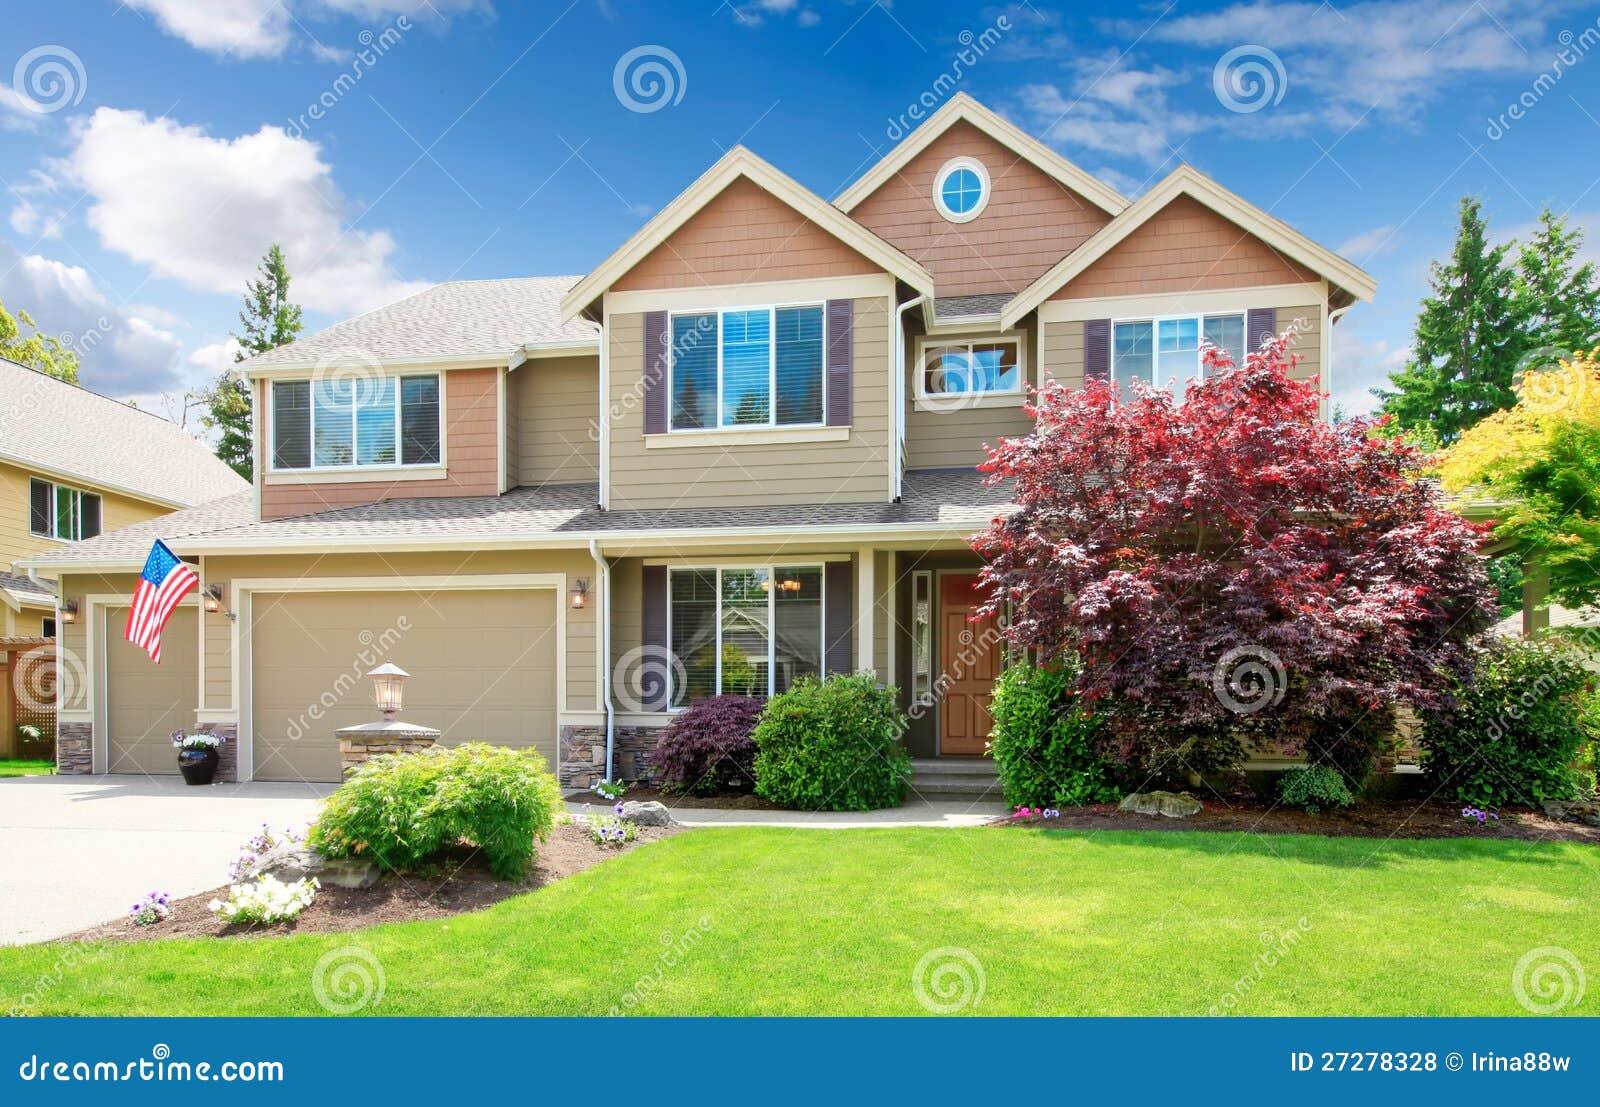 Amerikansk beige lyxig stor husfasadyttersida.